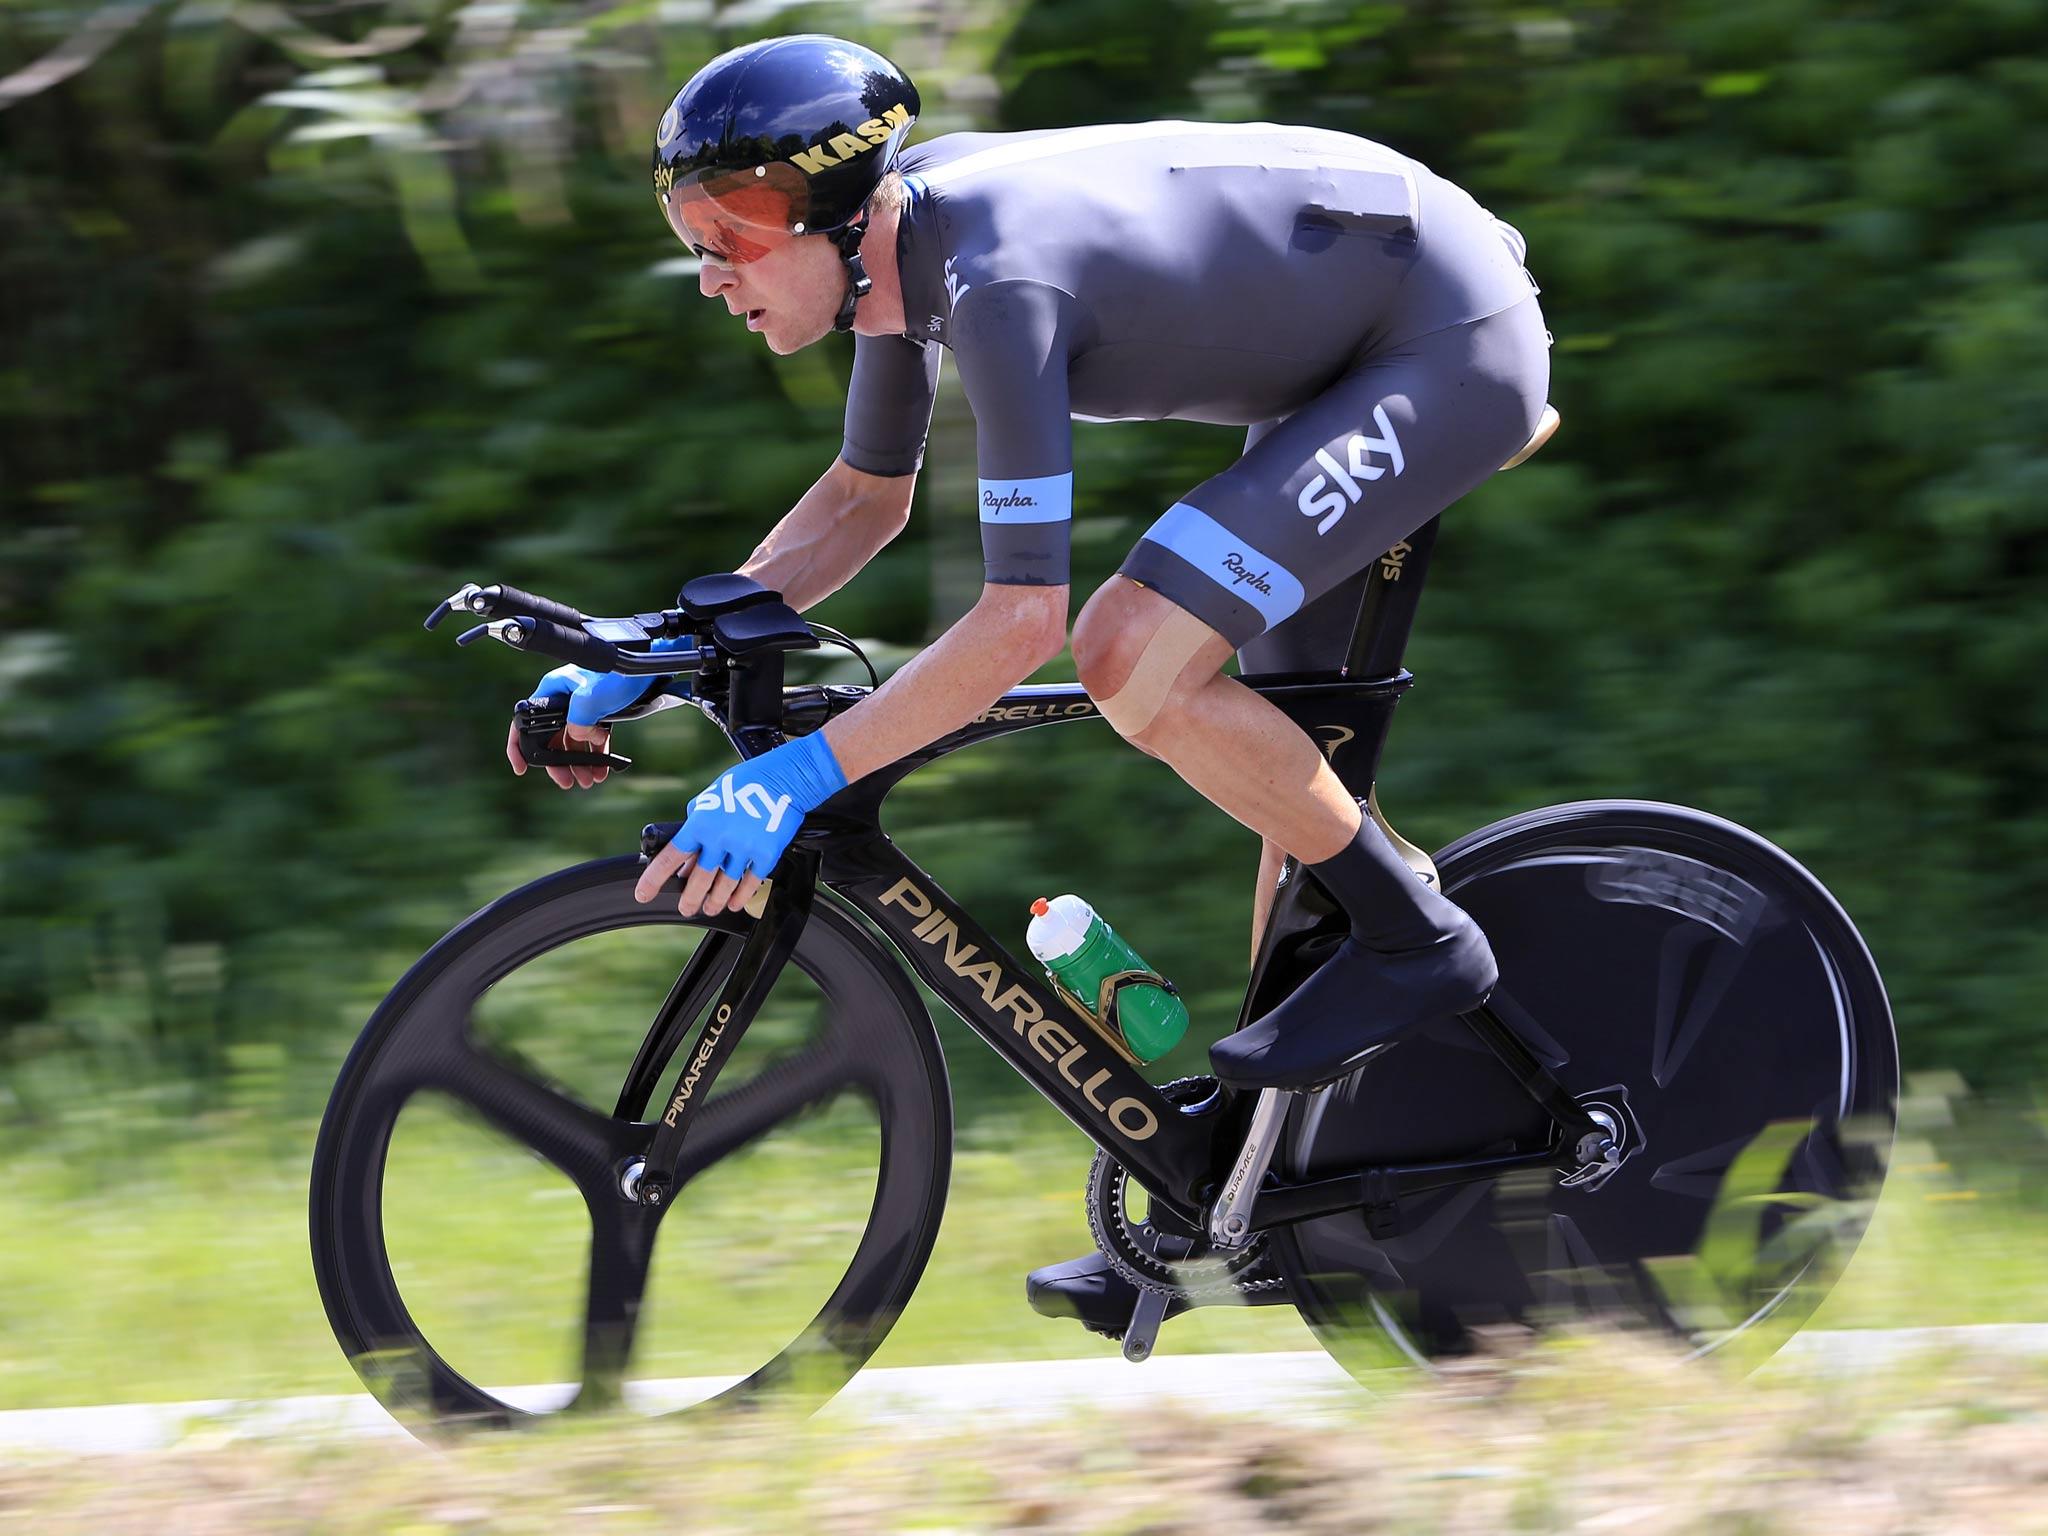 Giro d'Italia: Bradley Wiggins' struggles continue in rain-soaked ninth stage